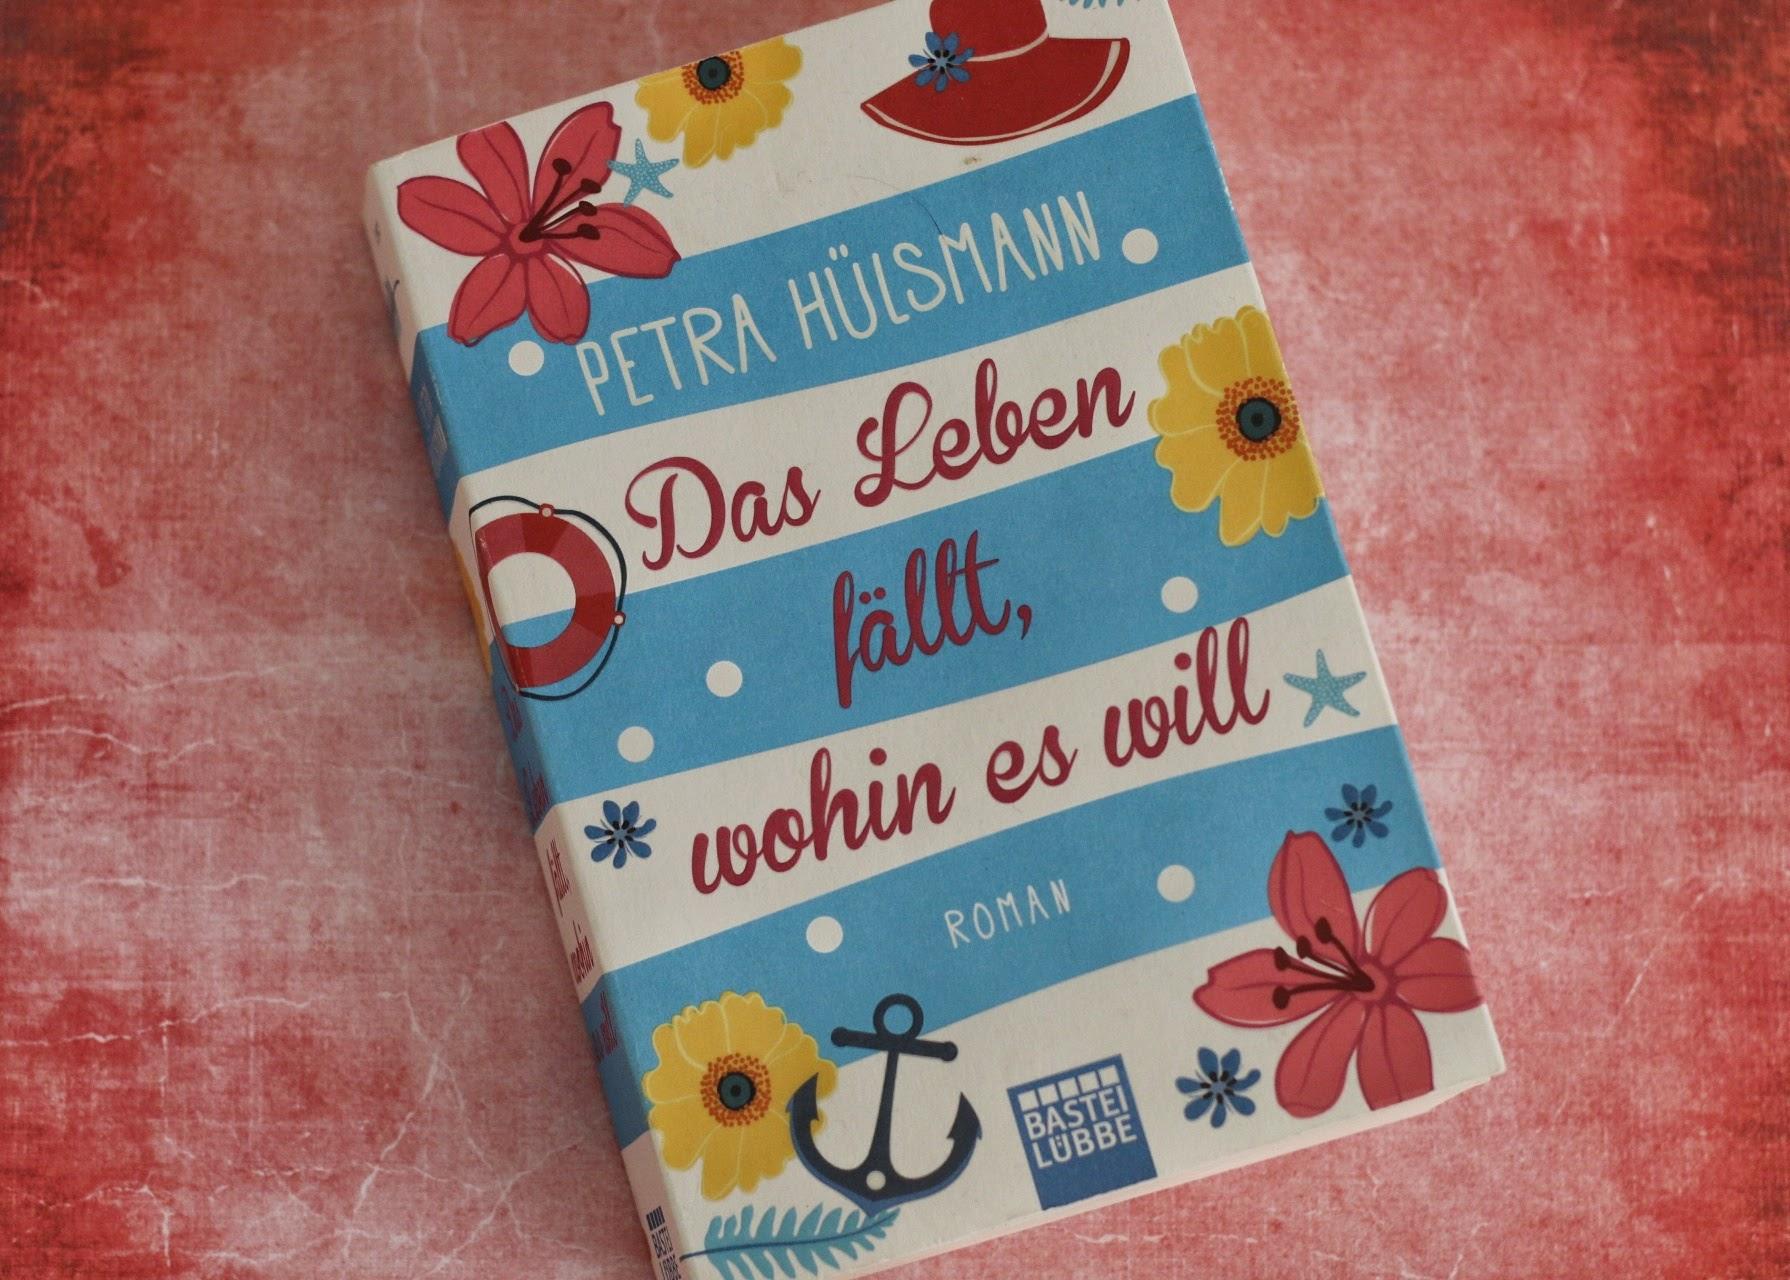 Das Leben fällt, wohin es will Petra Hülsmann Cover Lübbe Verlag Roman